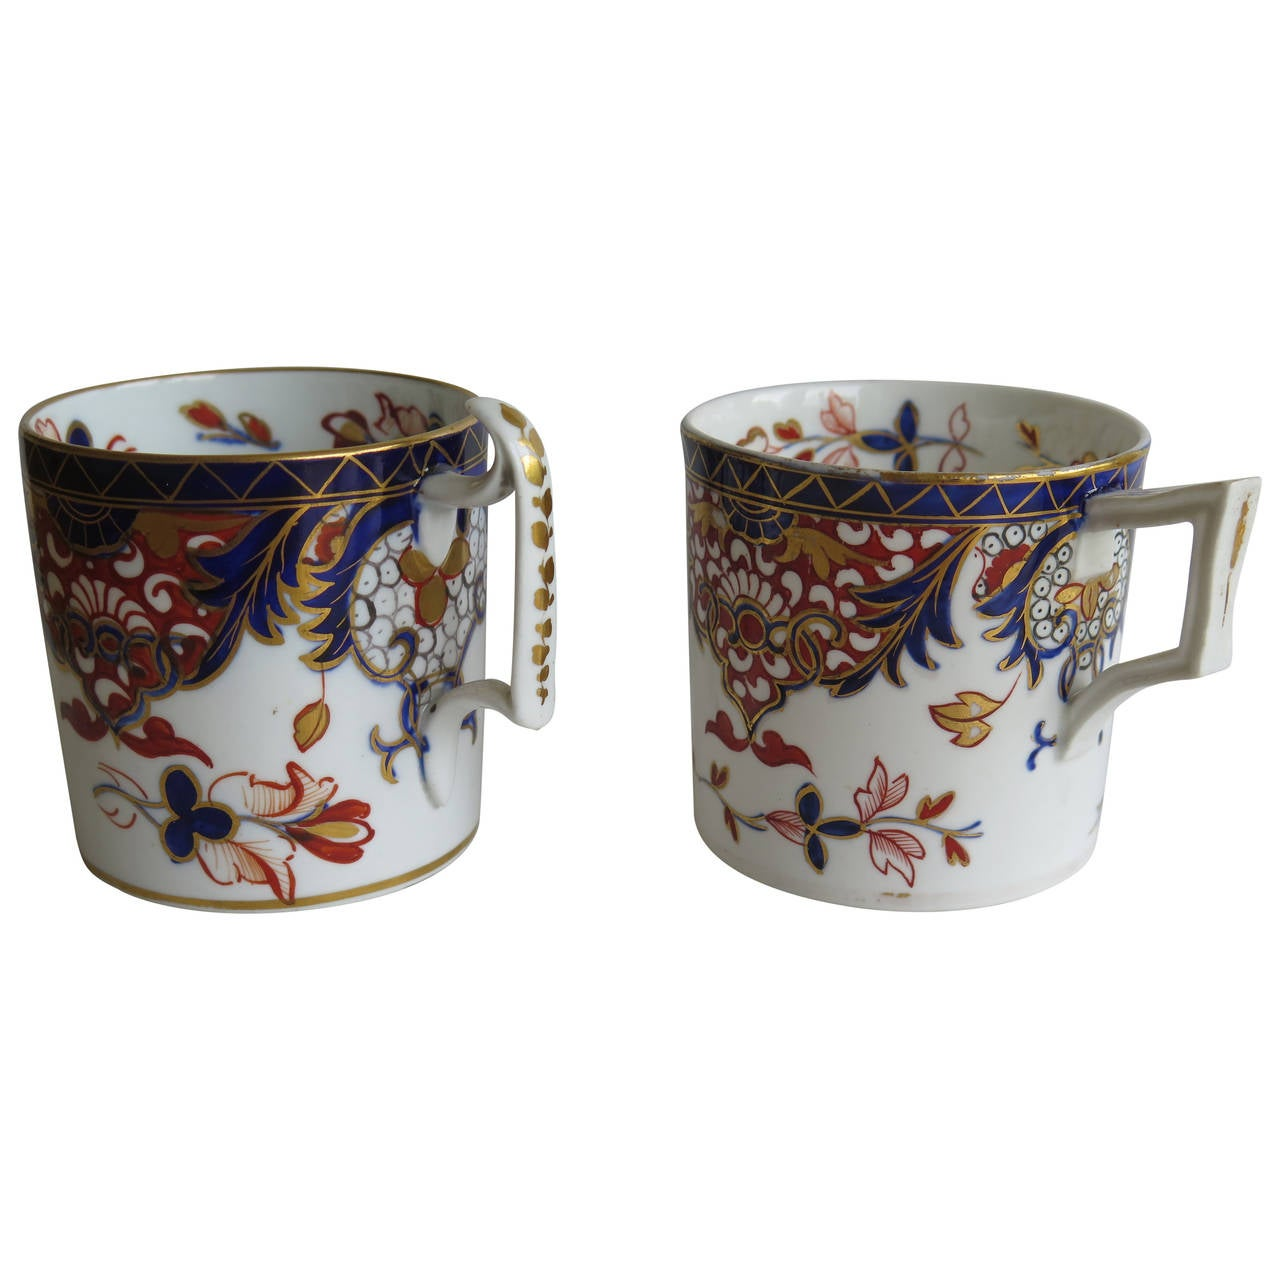 Similar Pair George 111 Derby Porcelain Coffee Cans Old Japan Pattern, Ca 1810